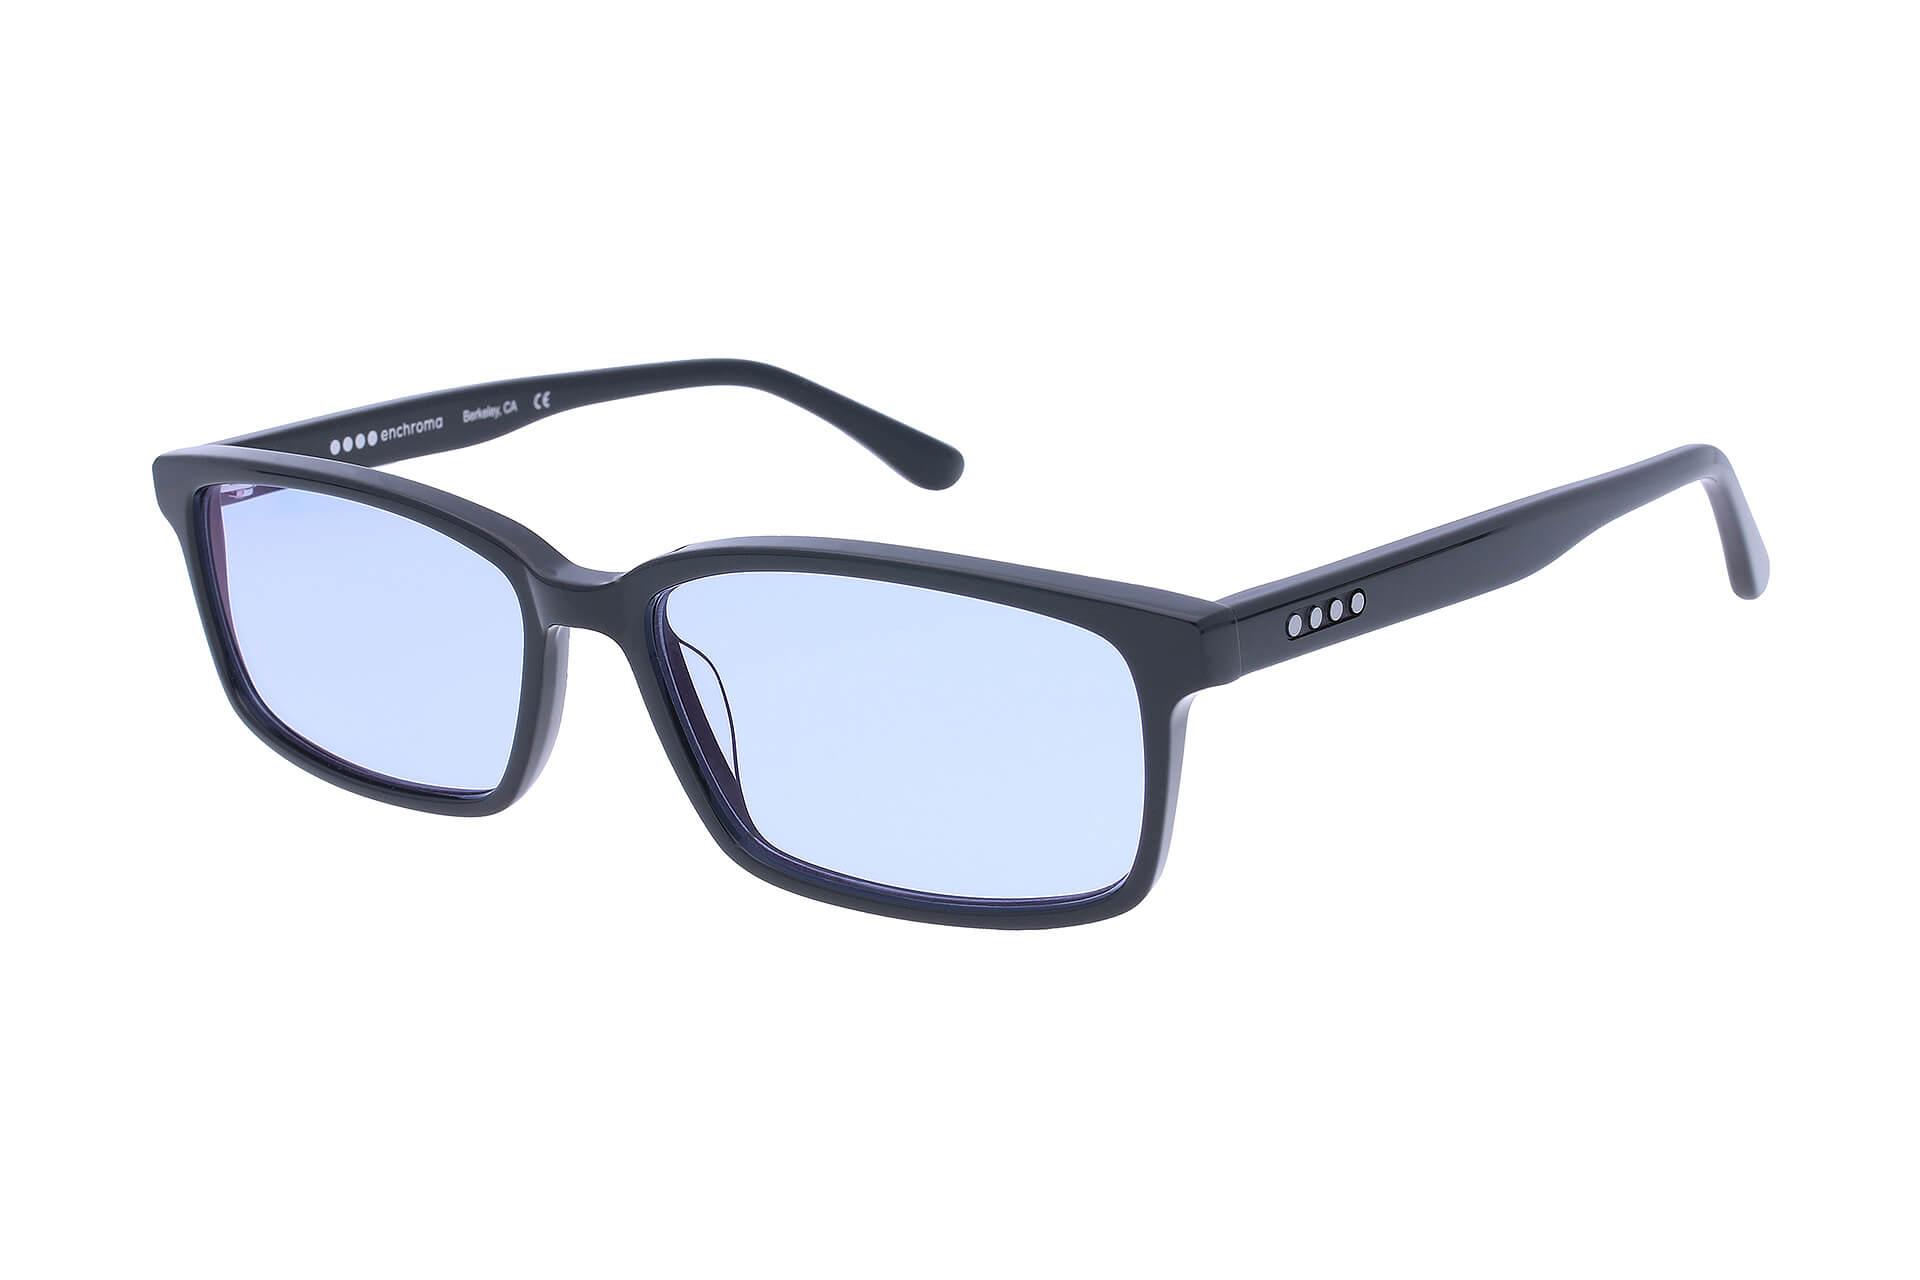 Enchroma-Brille